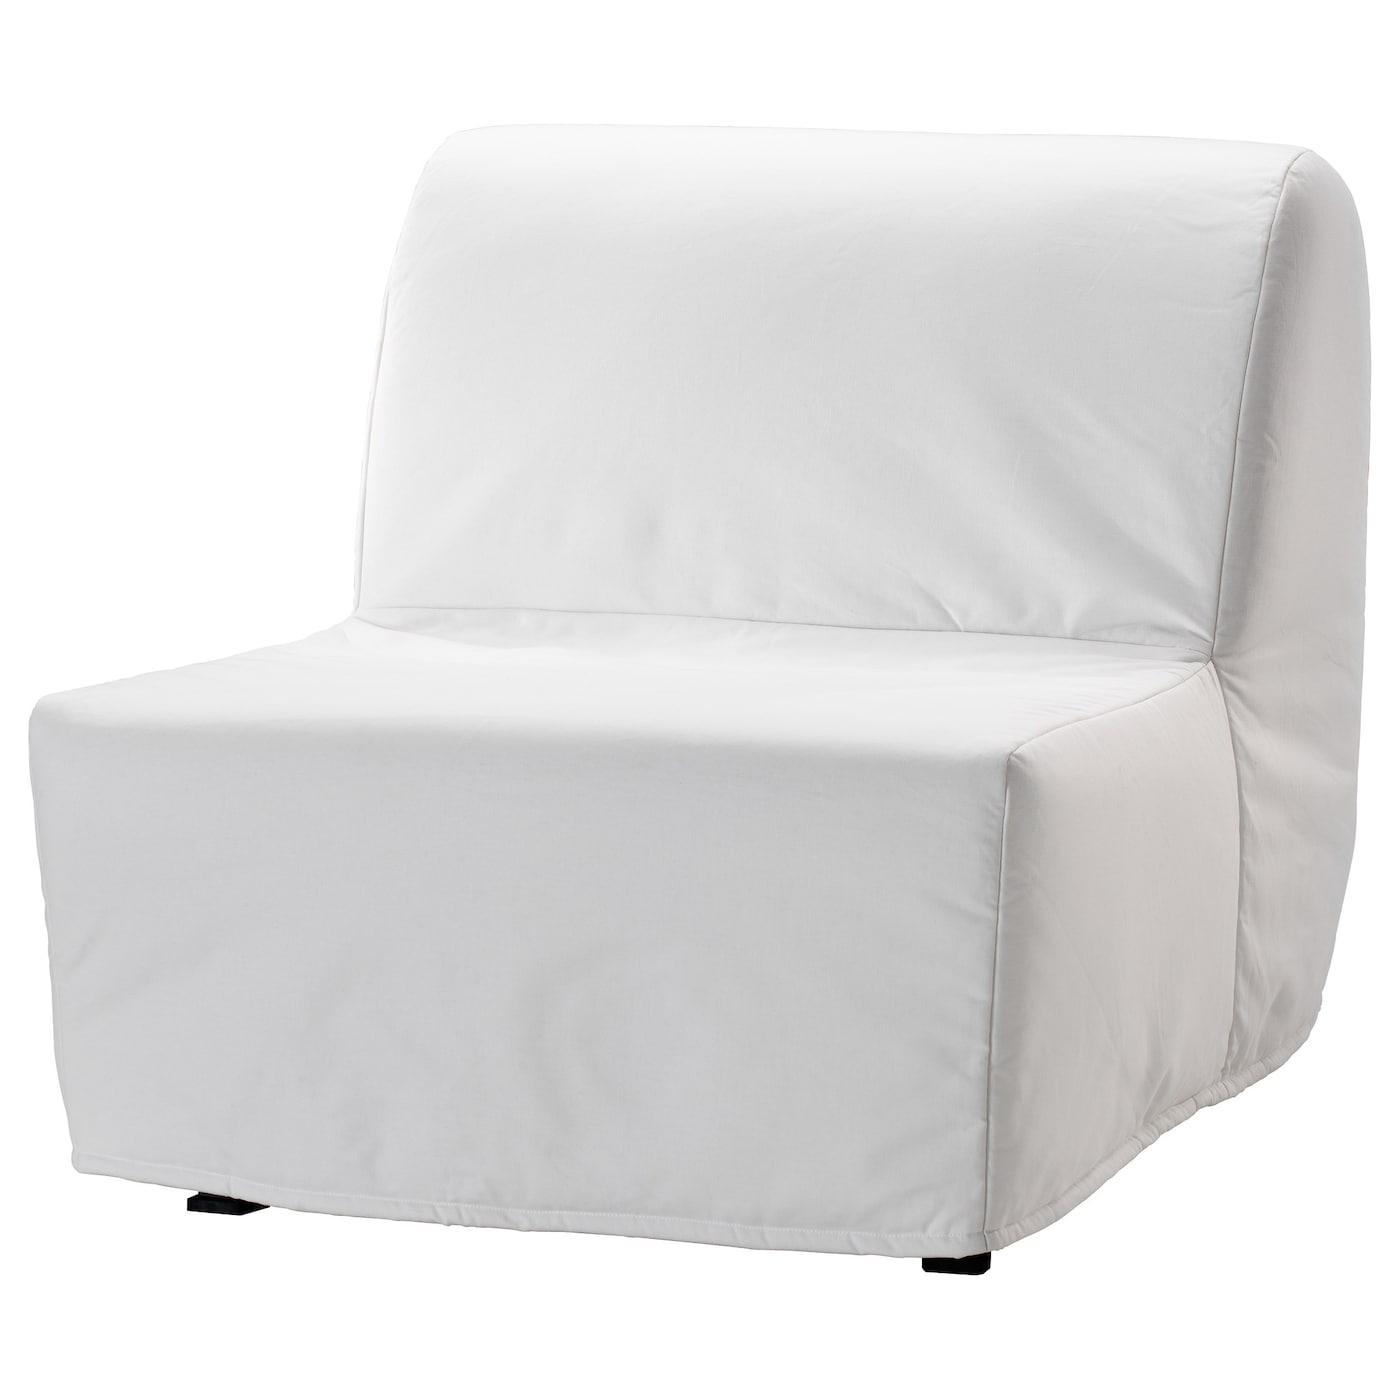 Lycksele LÖvÅs Ransta White Chair Bed